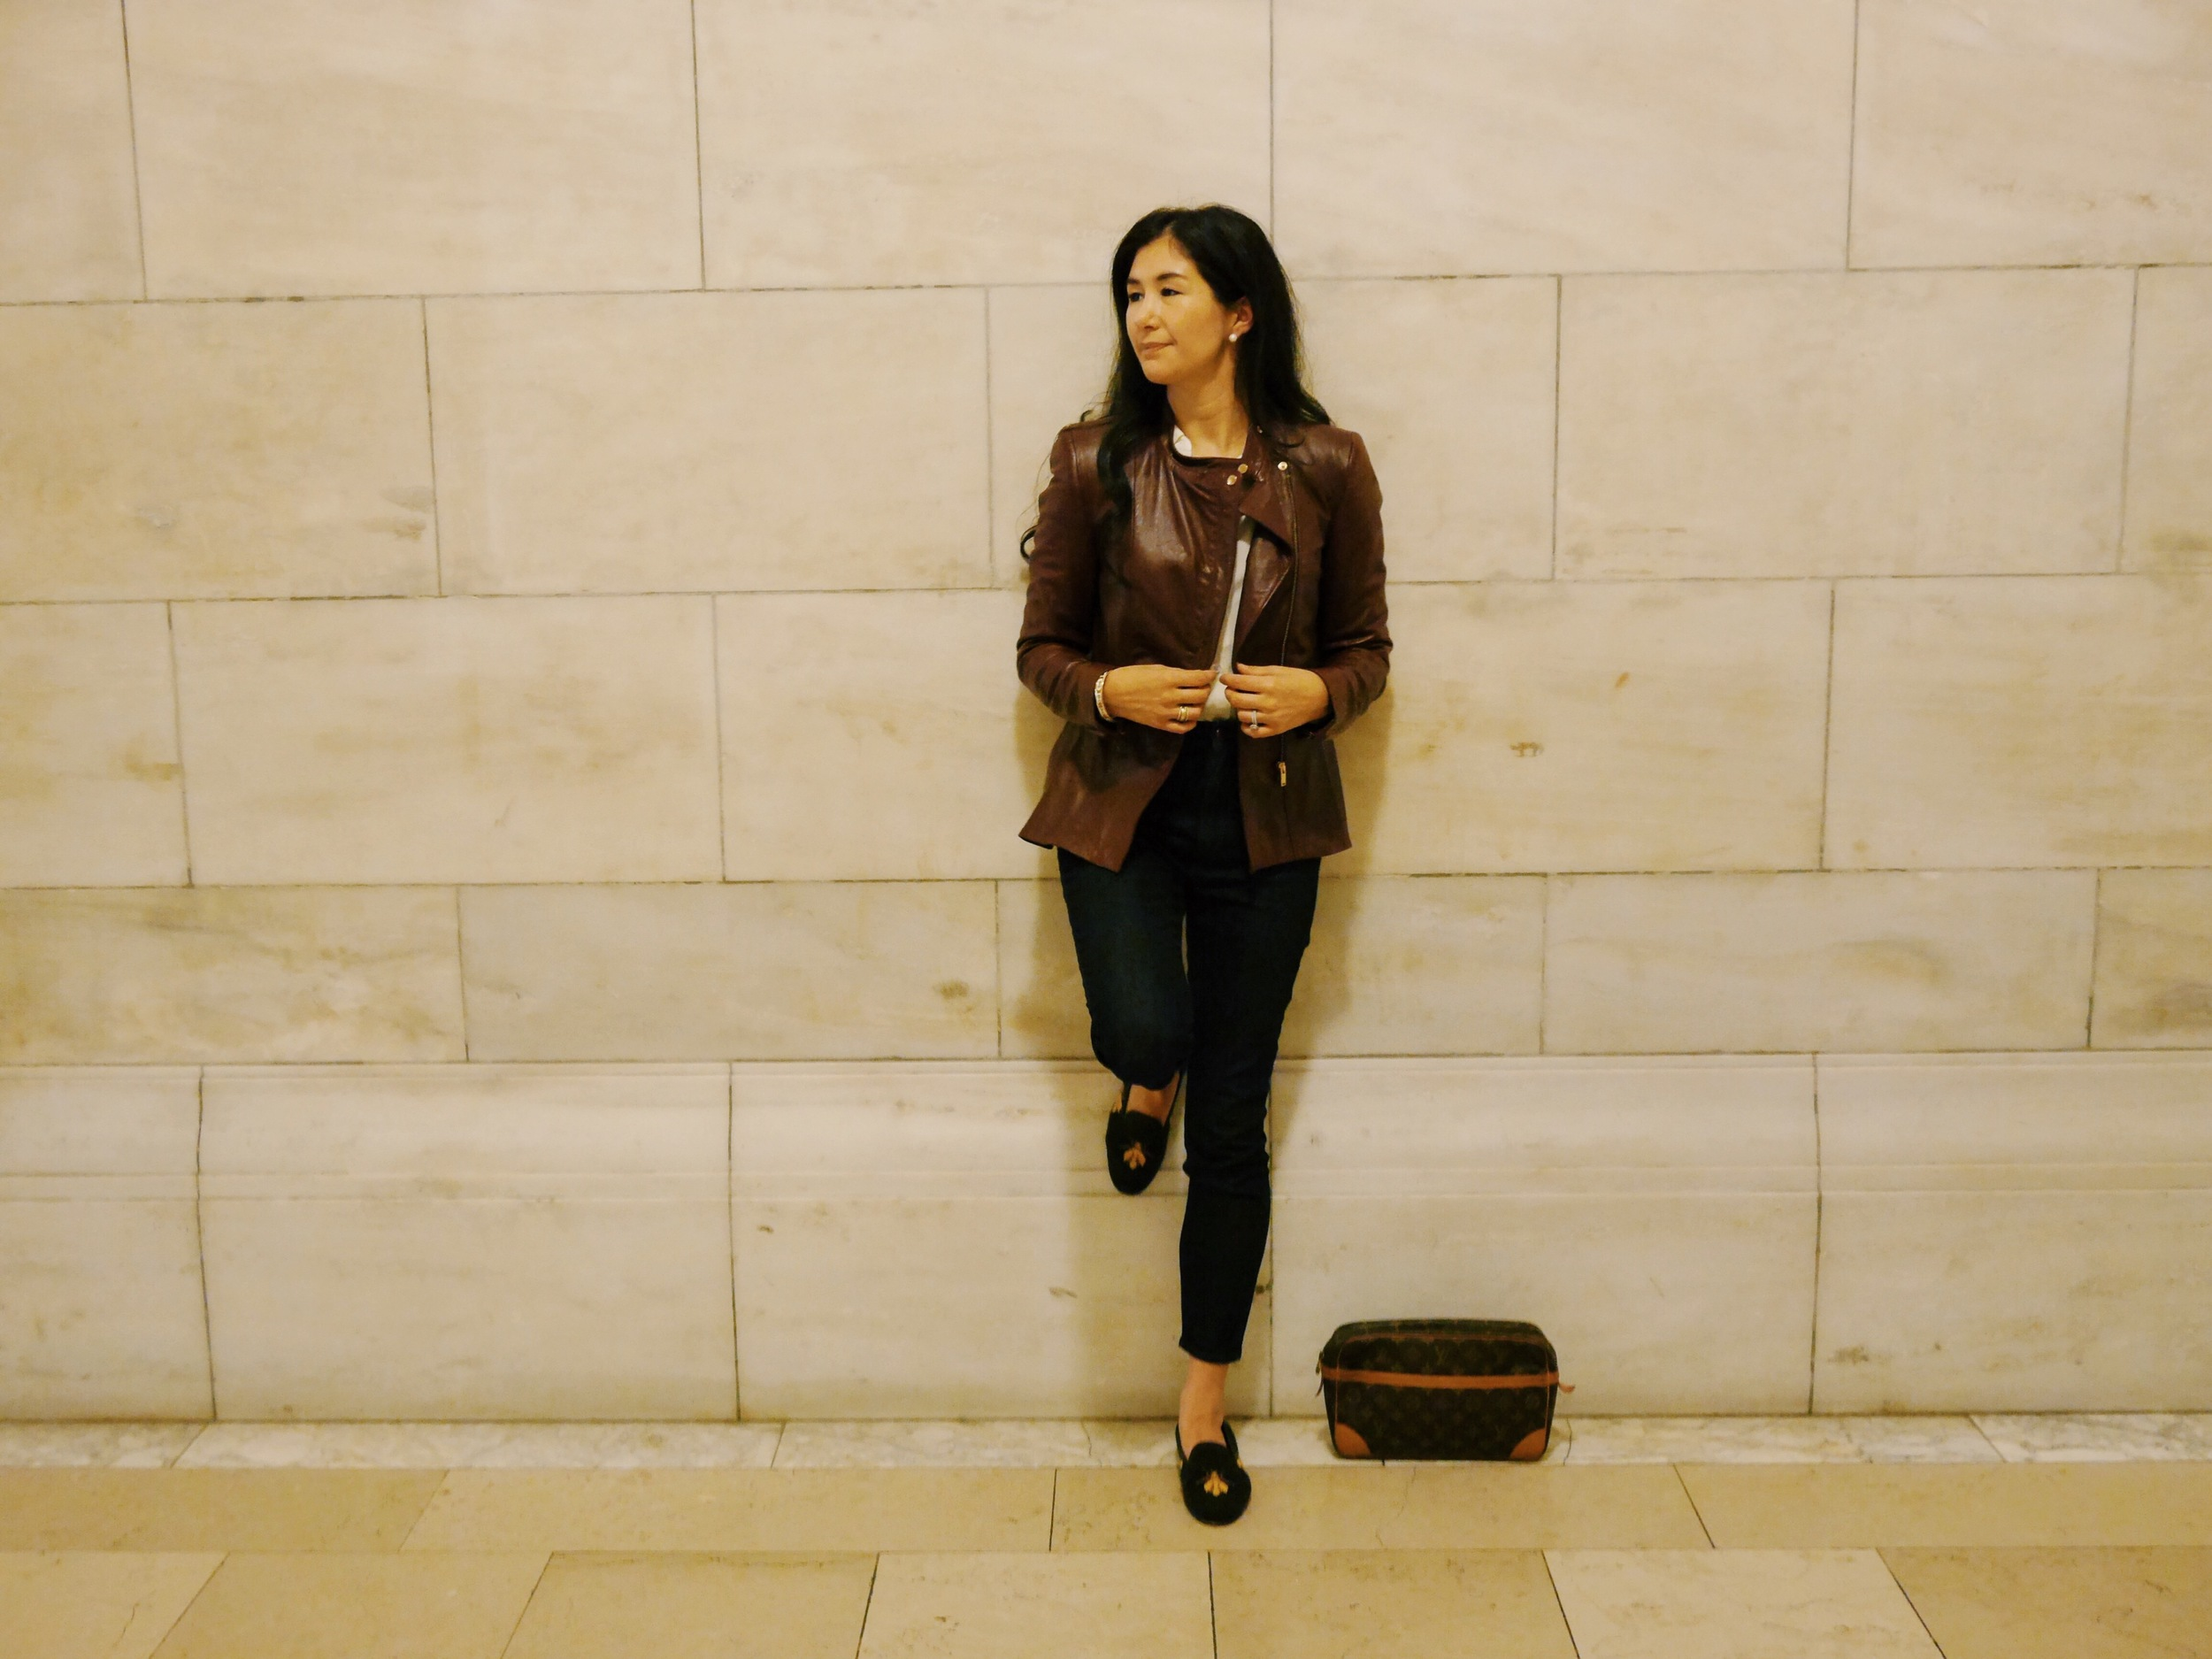 Zara Leather Jacket LOFT Skinny Jeans Everlane Silk Shirt Stubbs and Wootton Shoes Hermes Bracelet J Crew Cashmere Cardigan